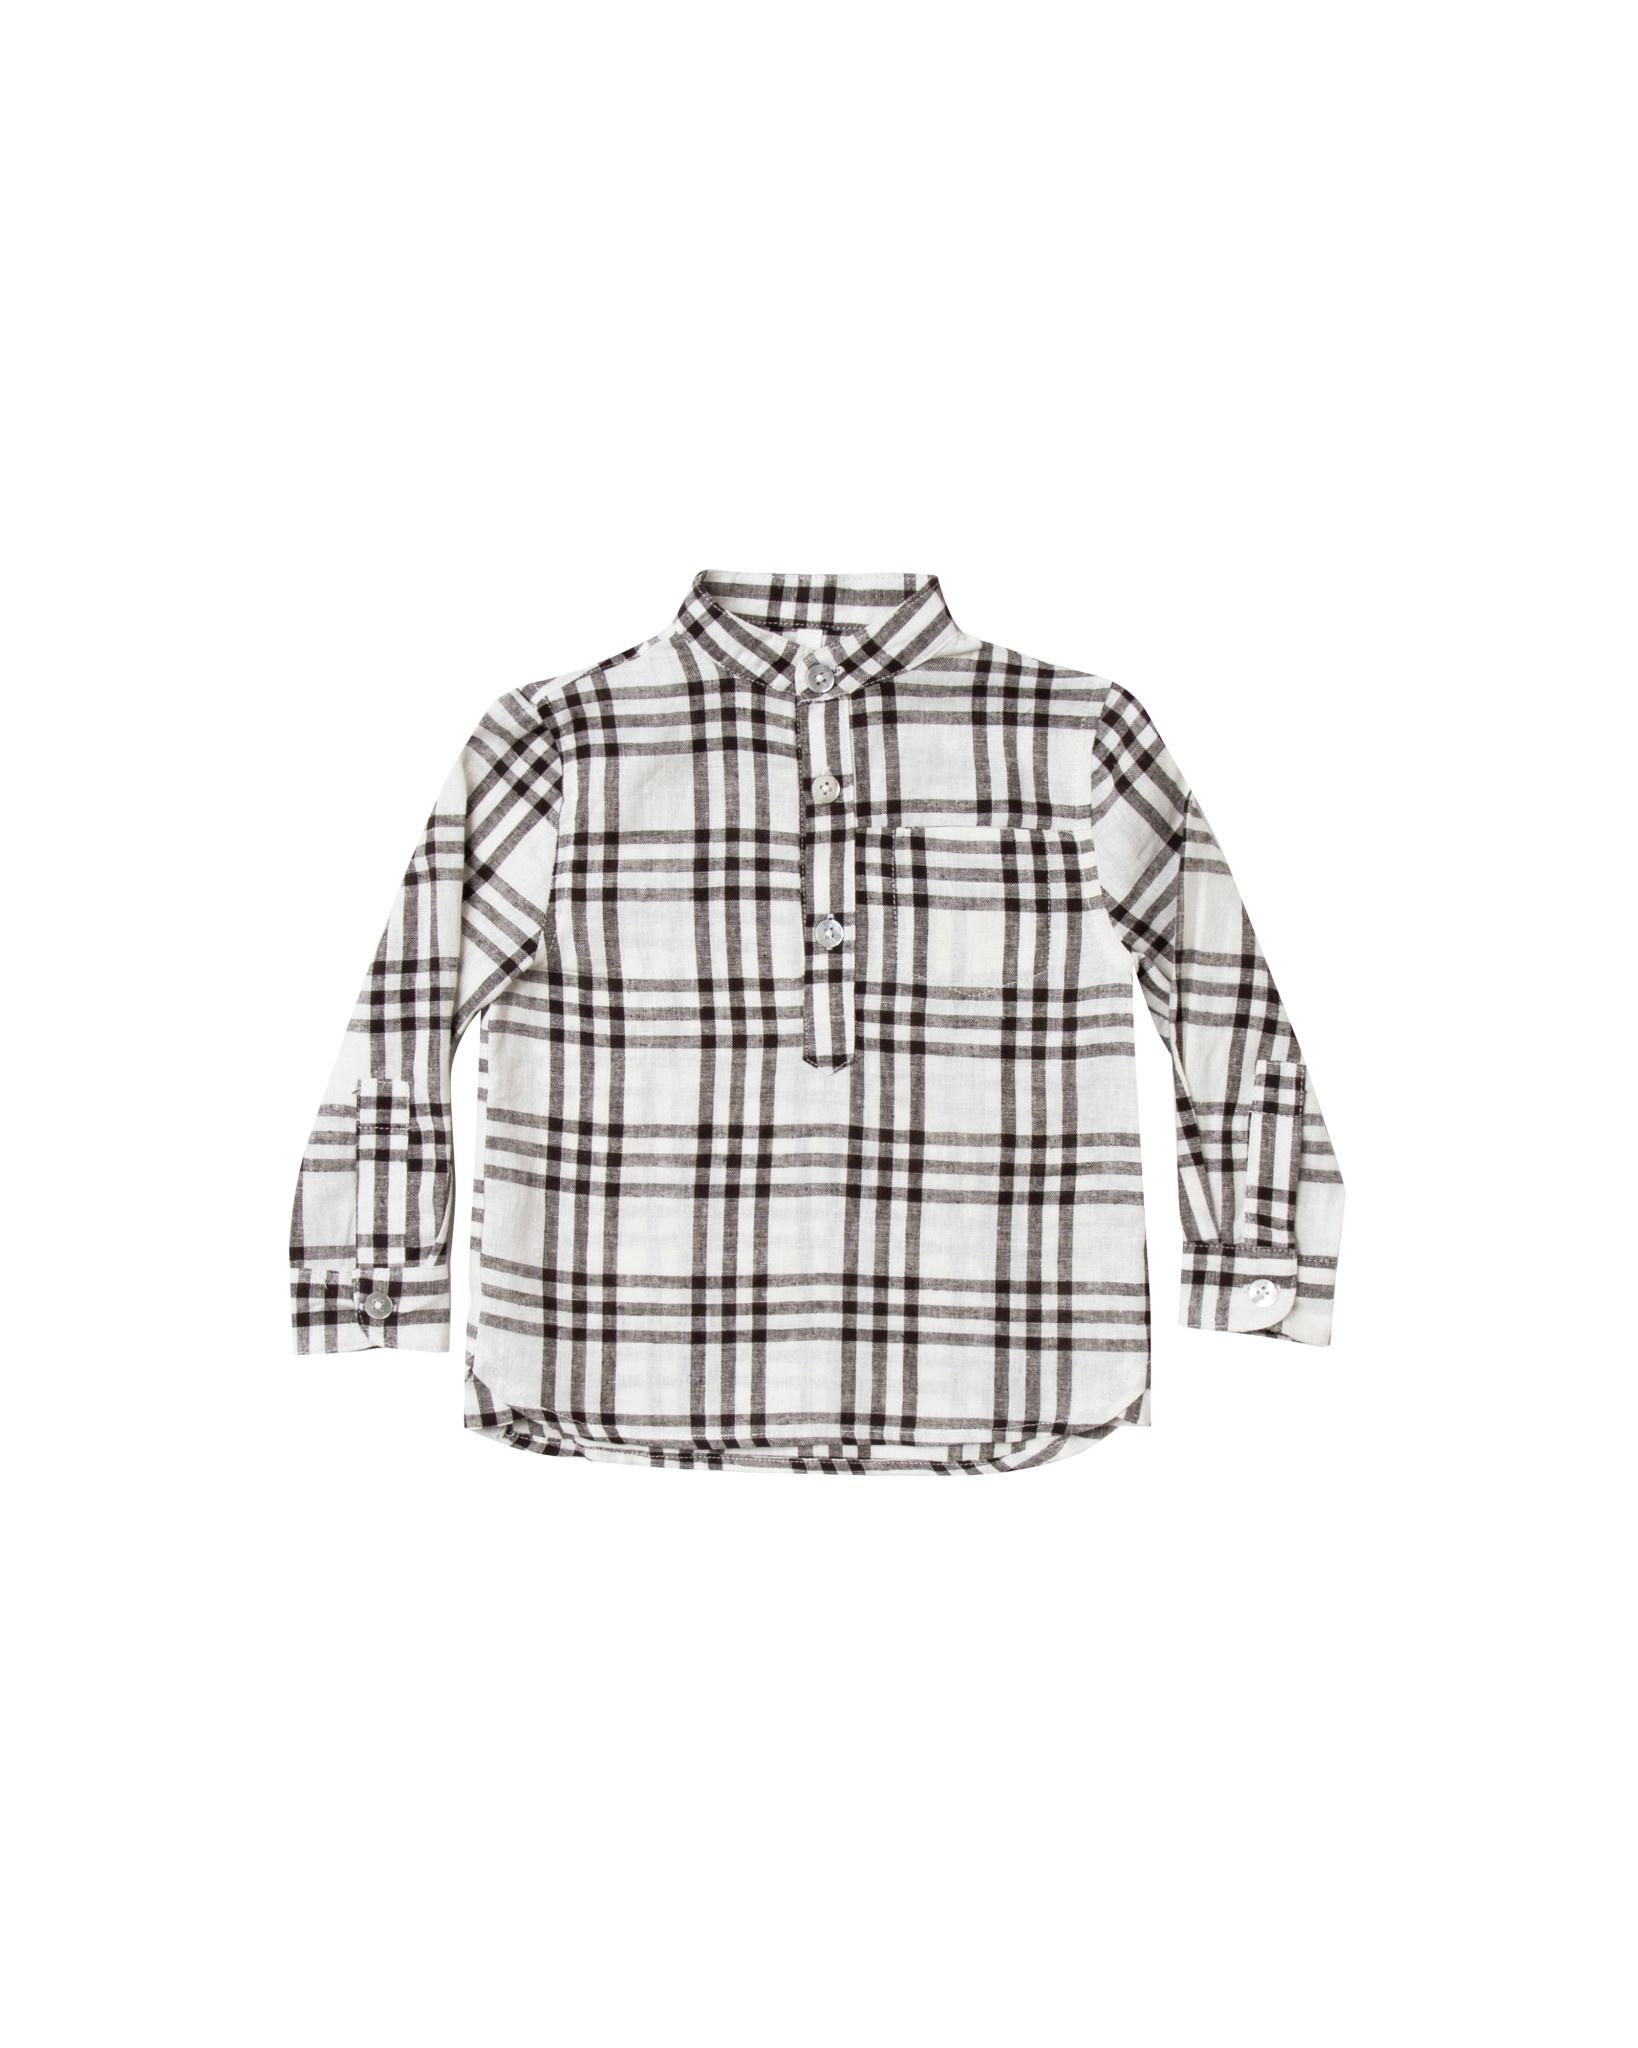 Rylee & Cru Check Mason Shirt